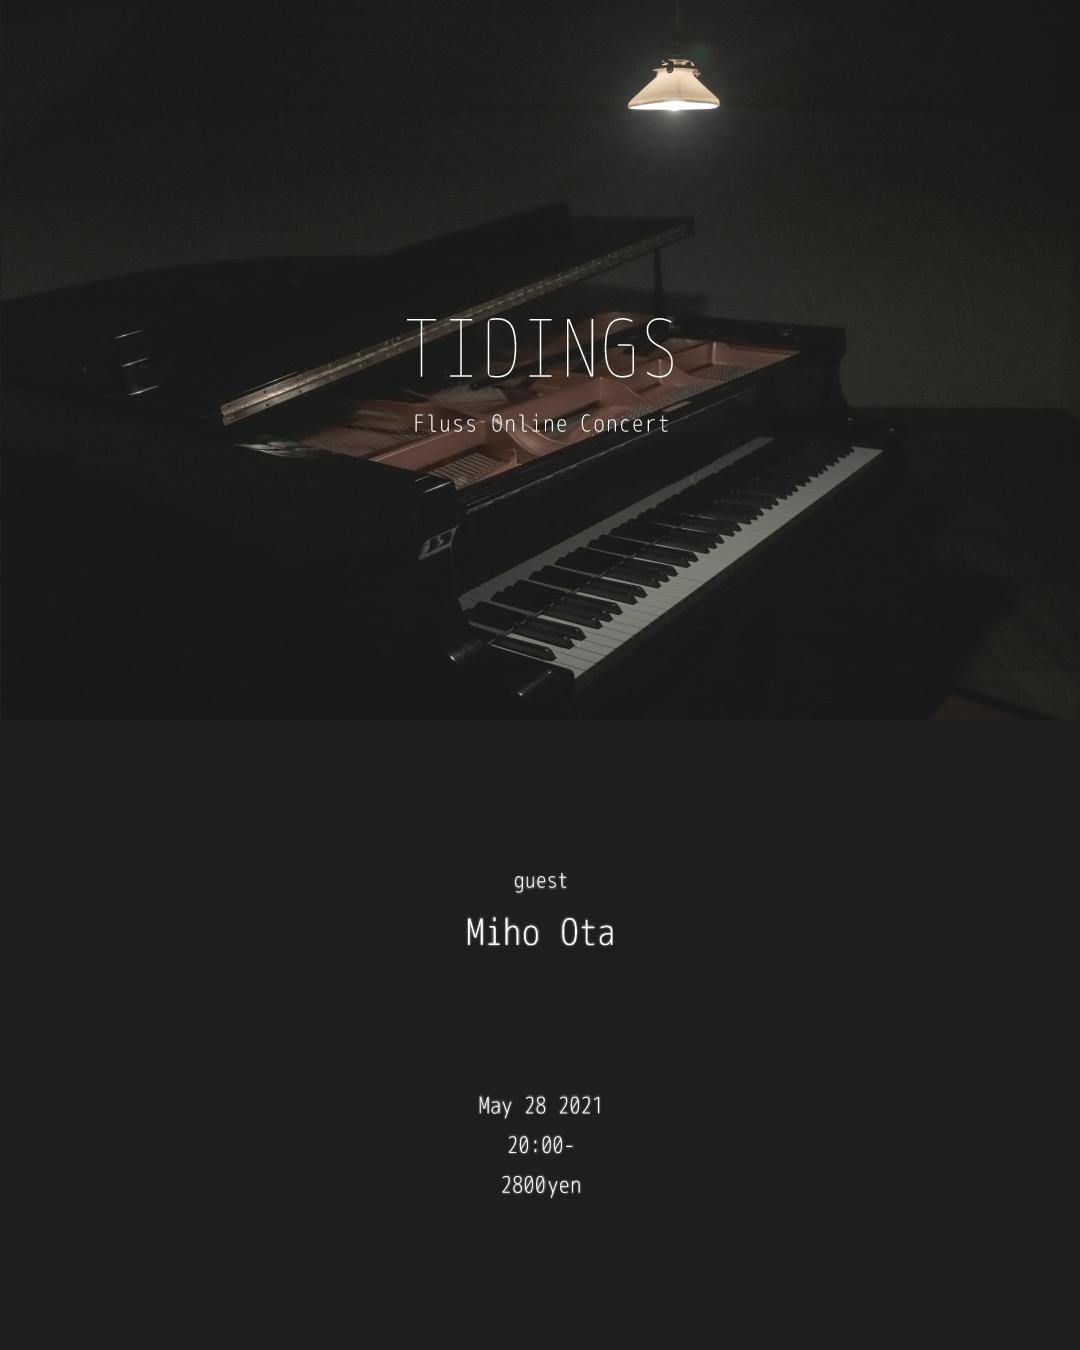 TIDINGS Fluss Online Concert 02